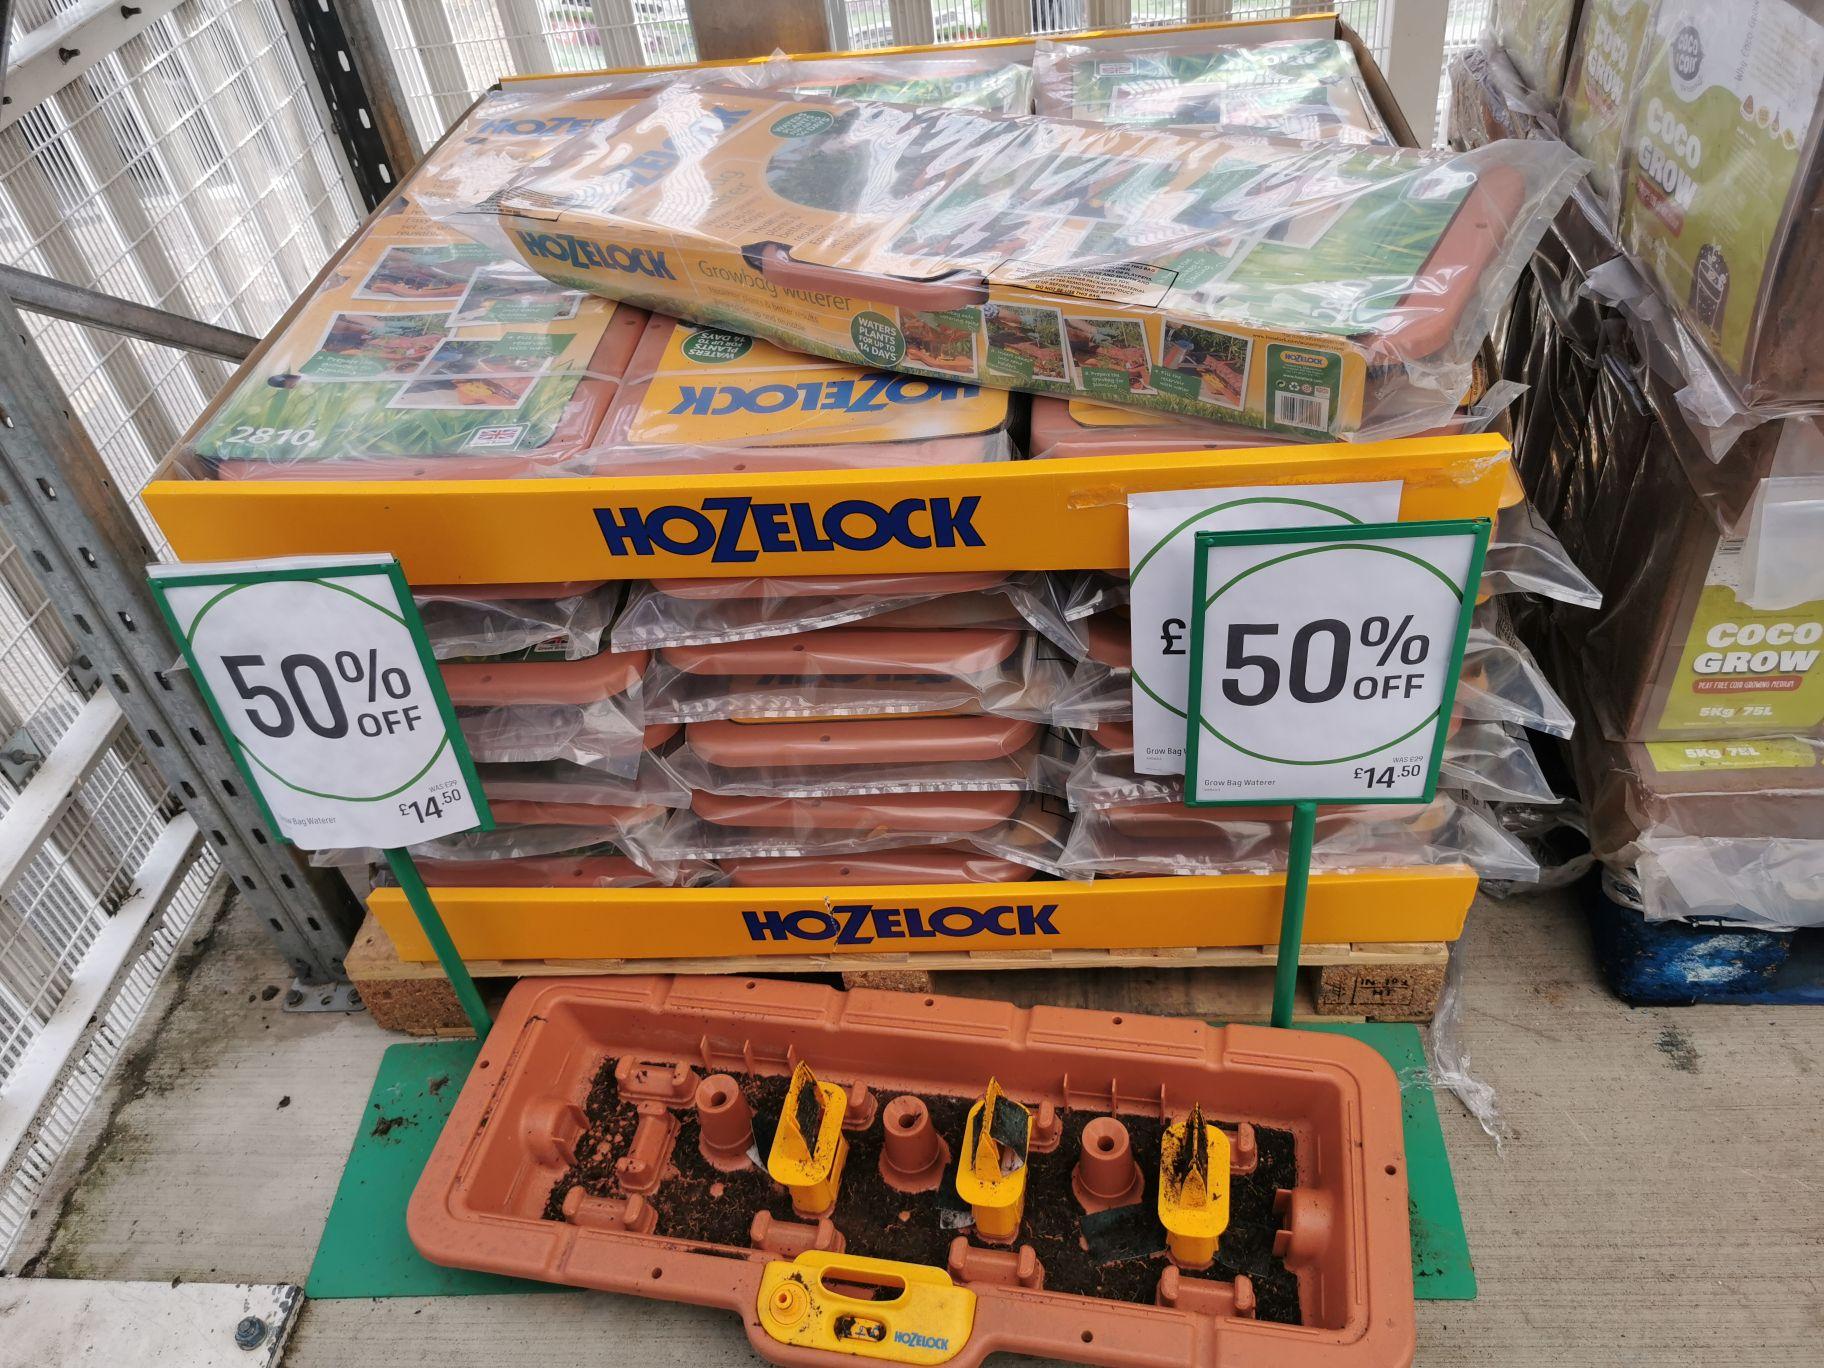 Hozelock growbag waterer £14.50 instore @ Homebase Hatfield